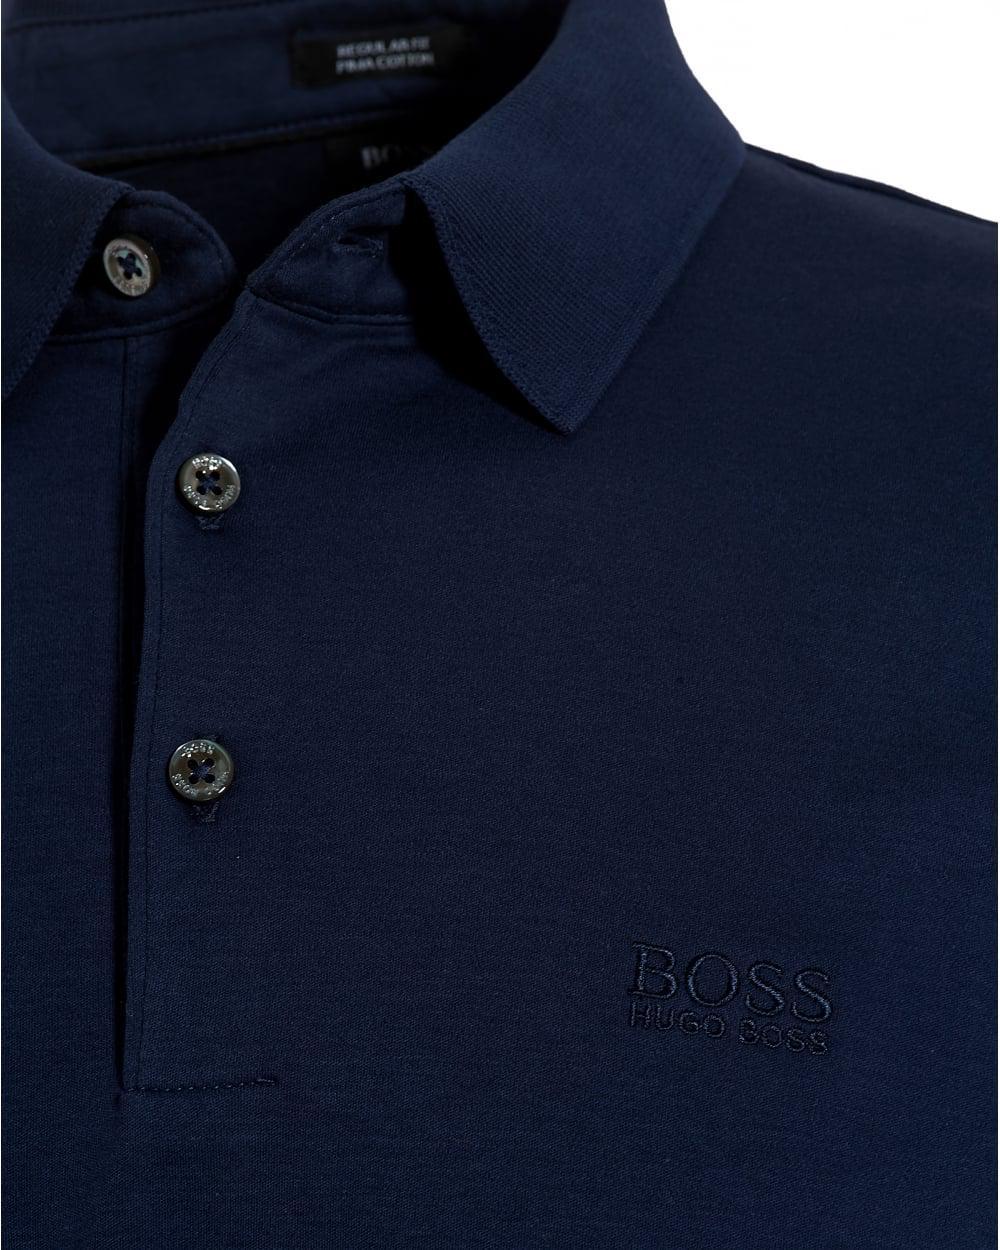 caaee92a8 BOSS Black Phillian Long Sleeve Polo, Navy Blue Regular Fit Polo ...